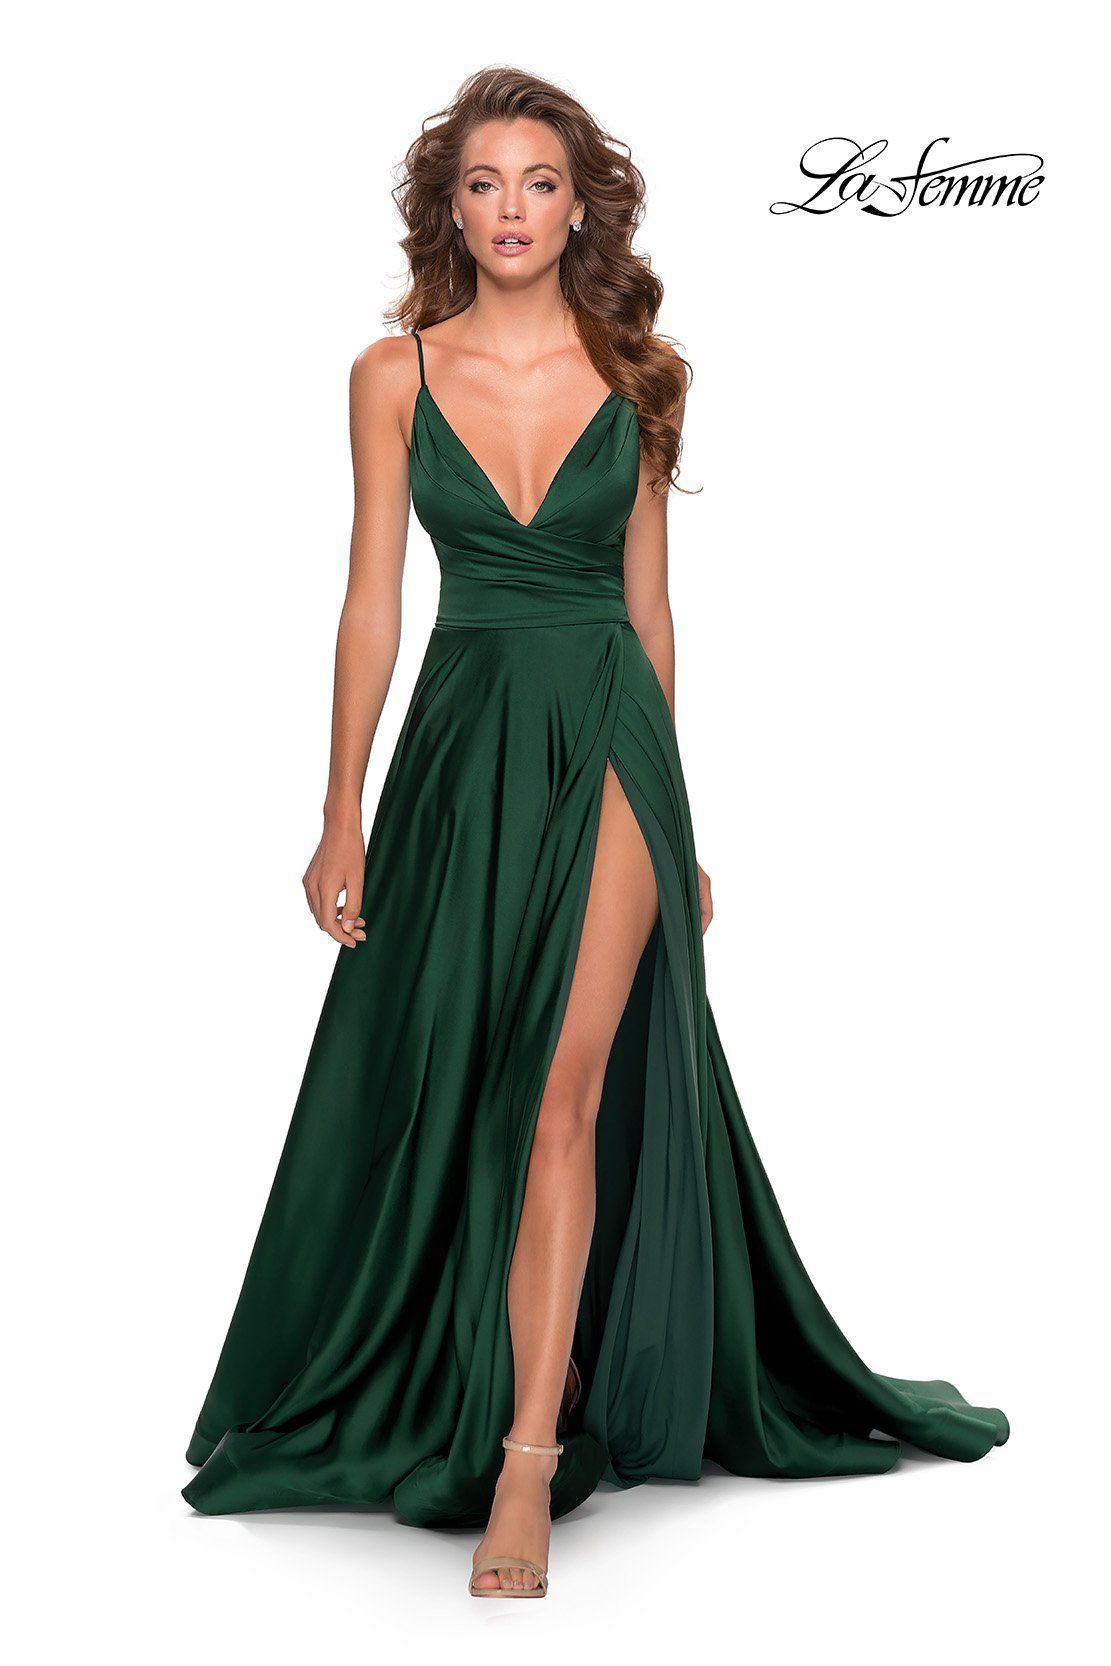 La Femme 28607 Dress - 6 / Navy